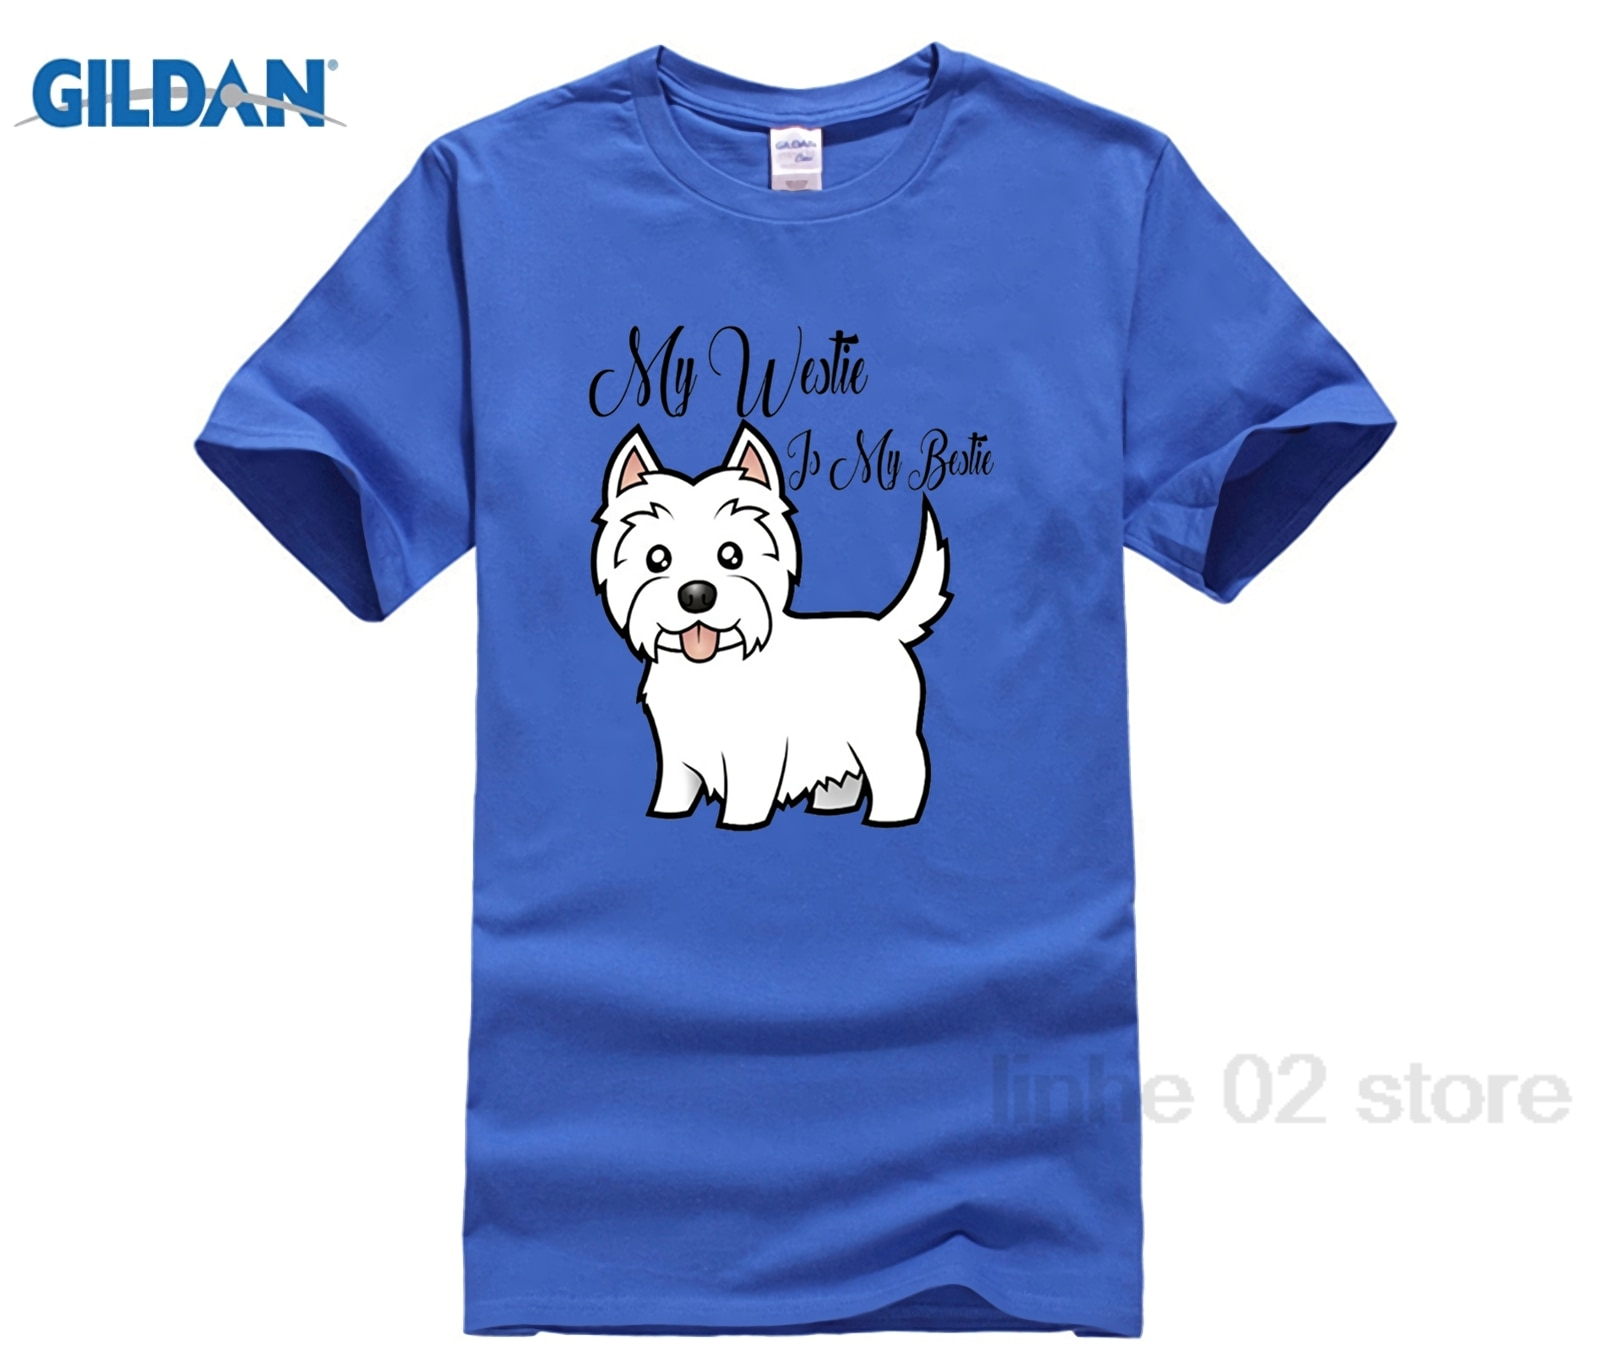 Mon Westie est mon Bestie-tee shirt blanc tee shirt homme